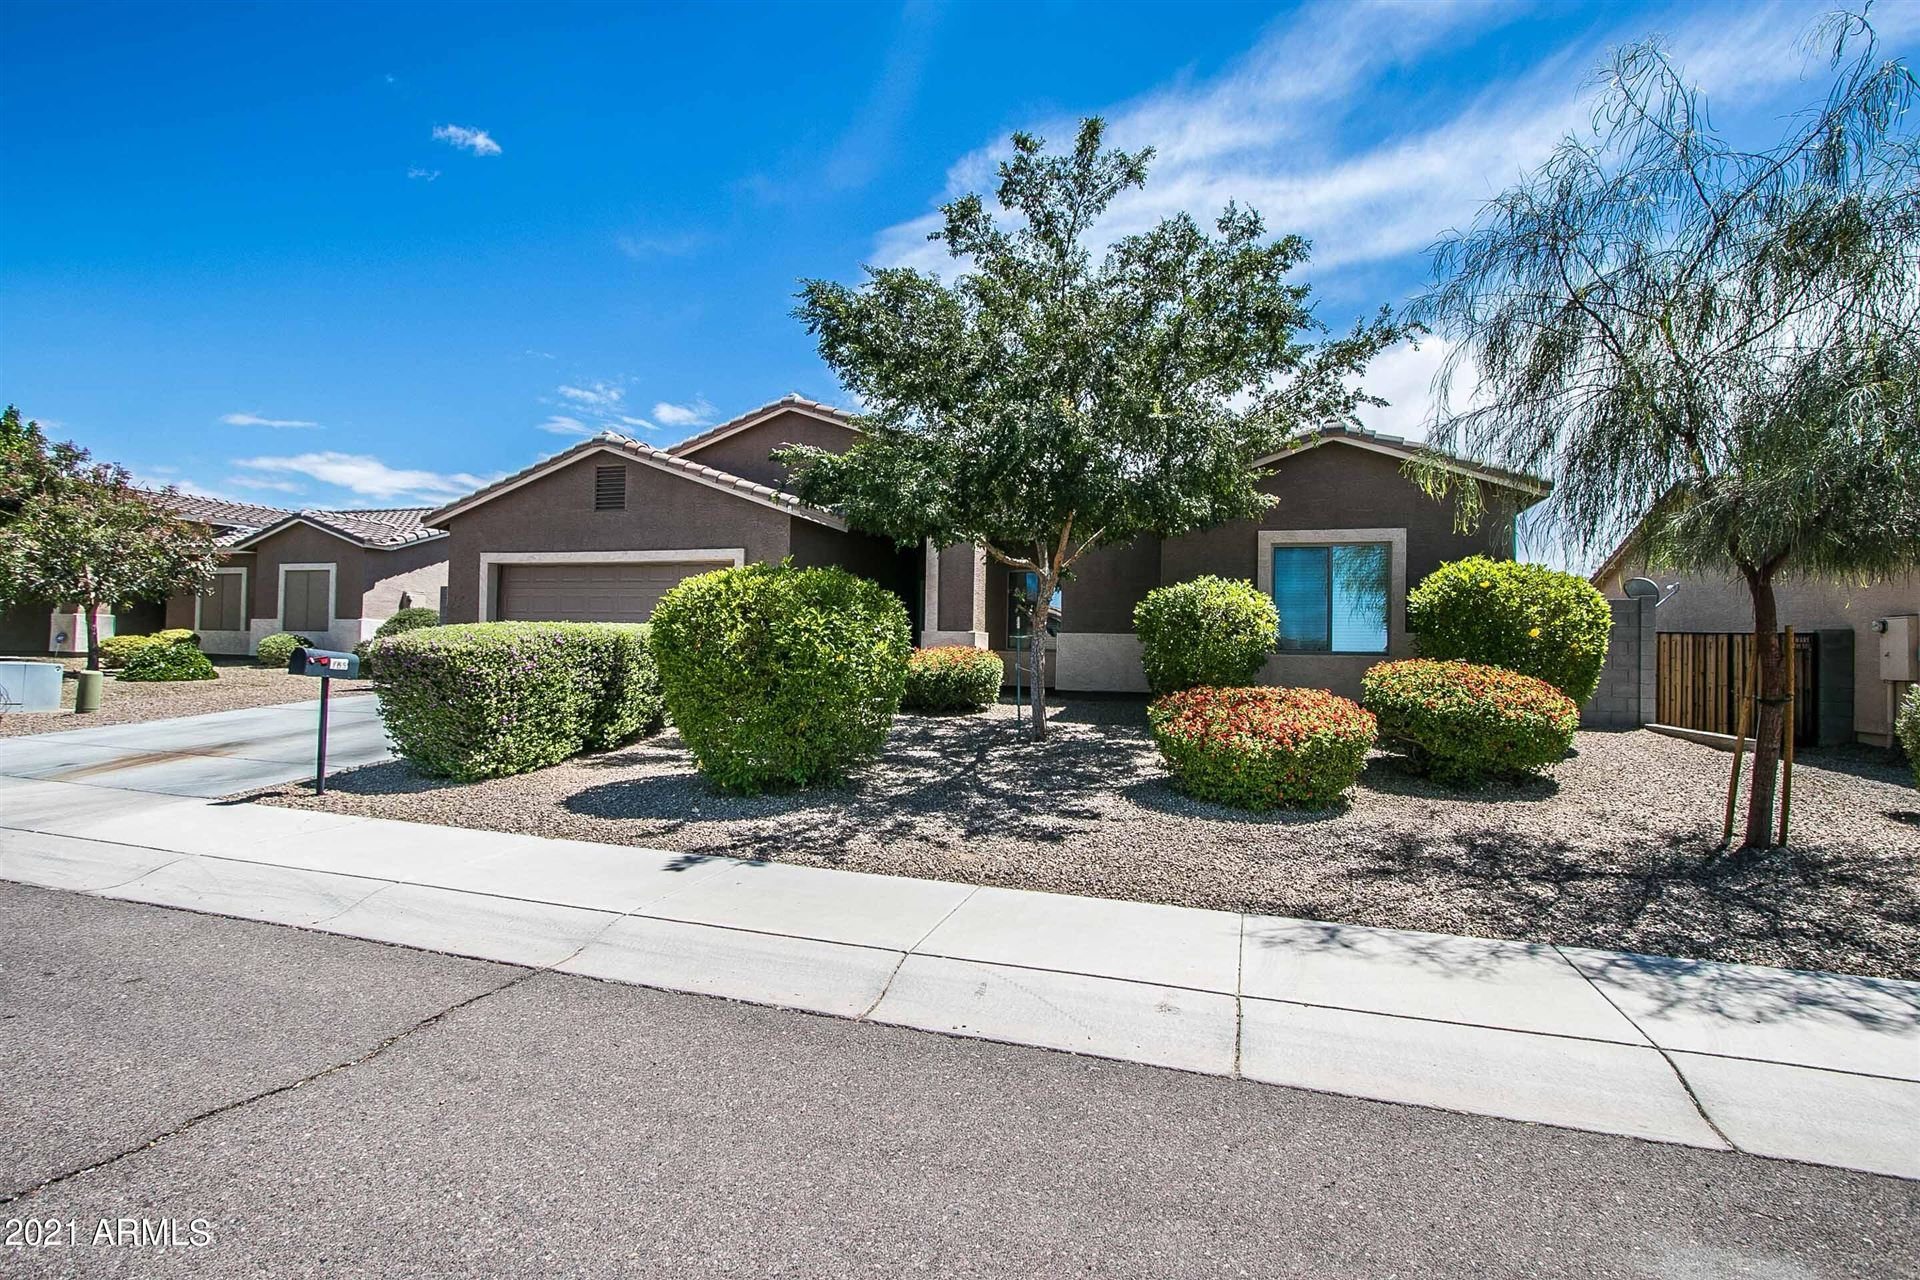 Photo of 1733 S PENSTEMON Drive, Apache Junction, AZ 85120 (MLS # 6230119)